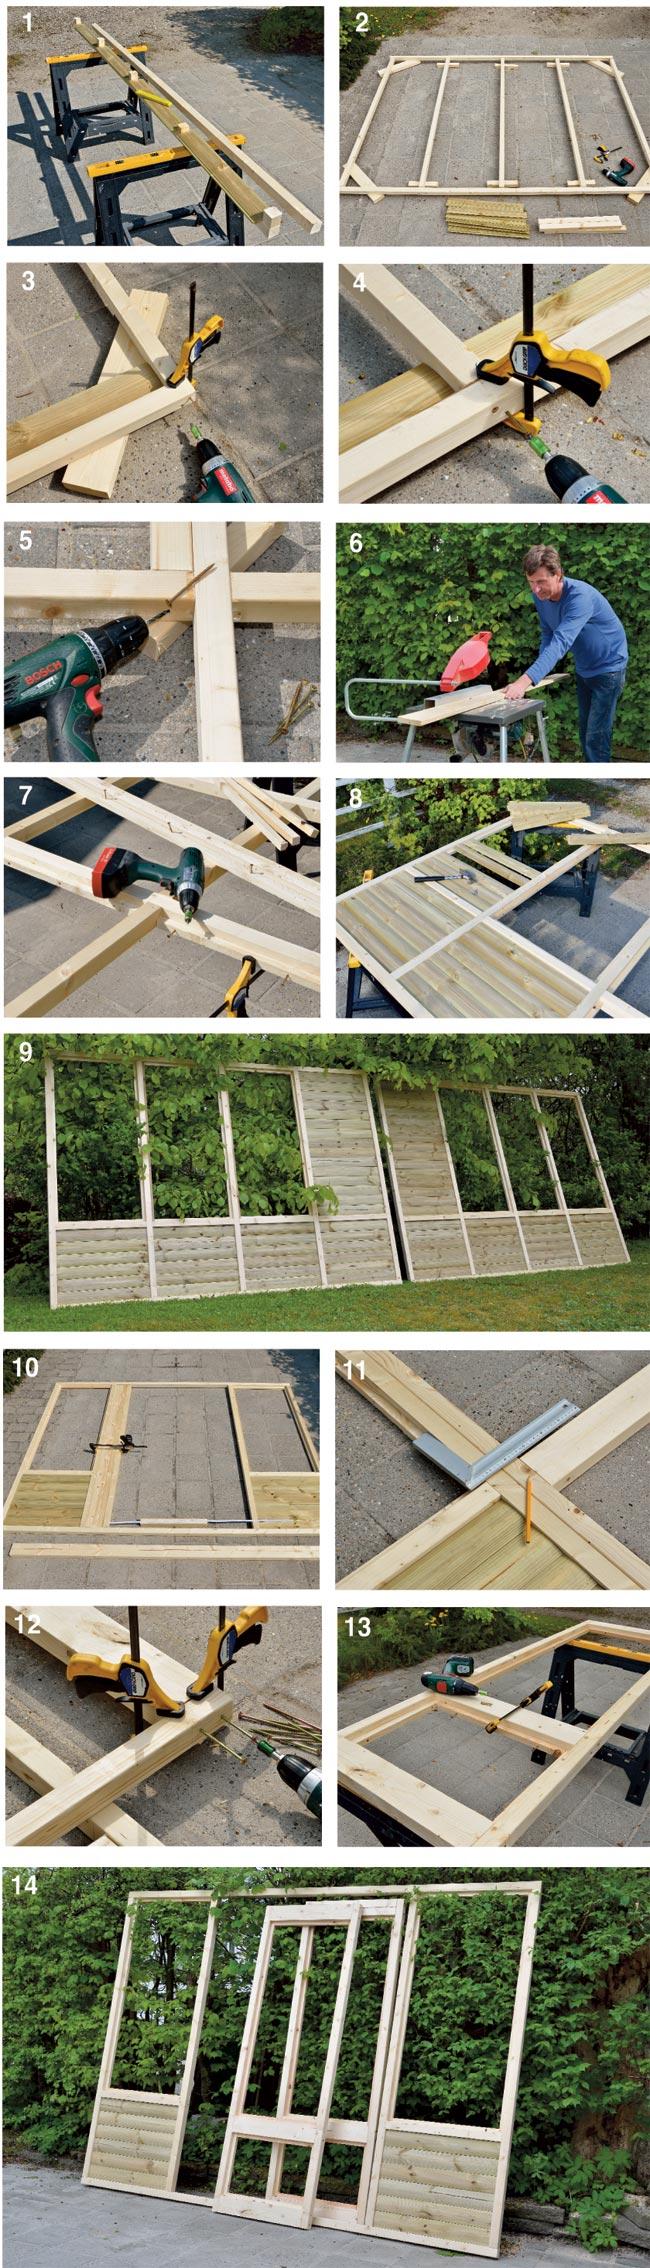 Casetta giardino costruire luci da giardino fai te alta - Costruire casette in legno fai da te ...